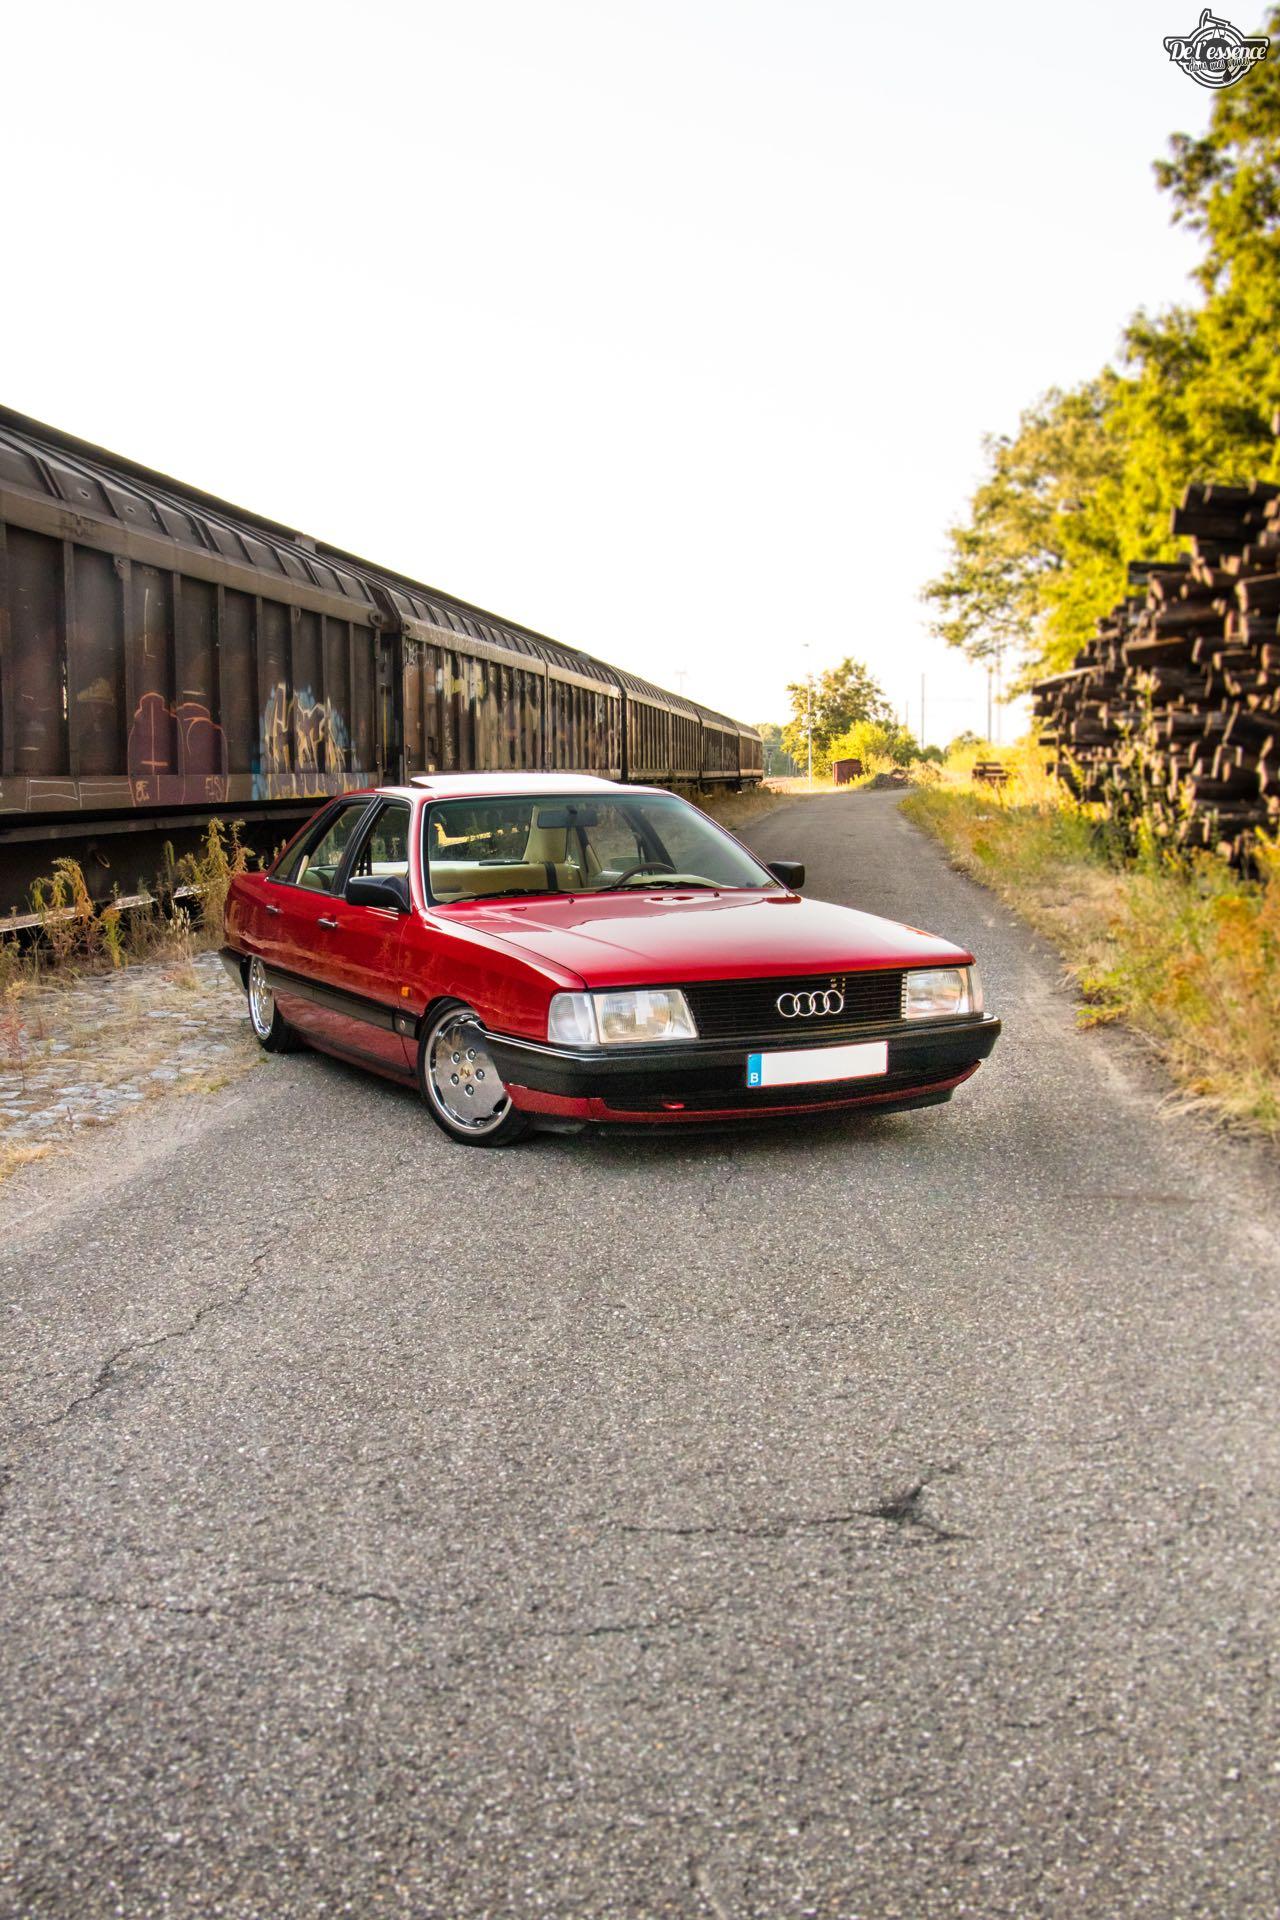 Bagged Audi 100 - Merci Papi ! 59